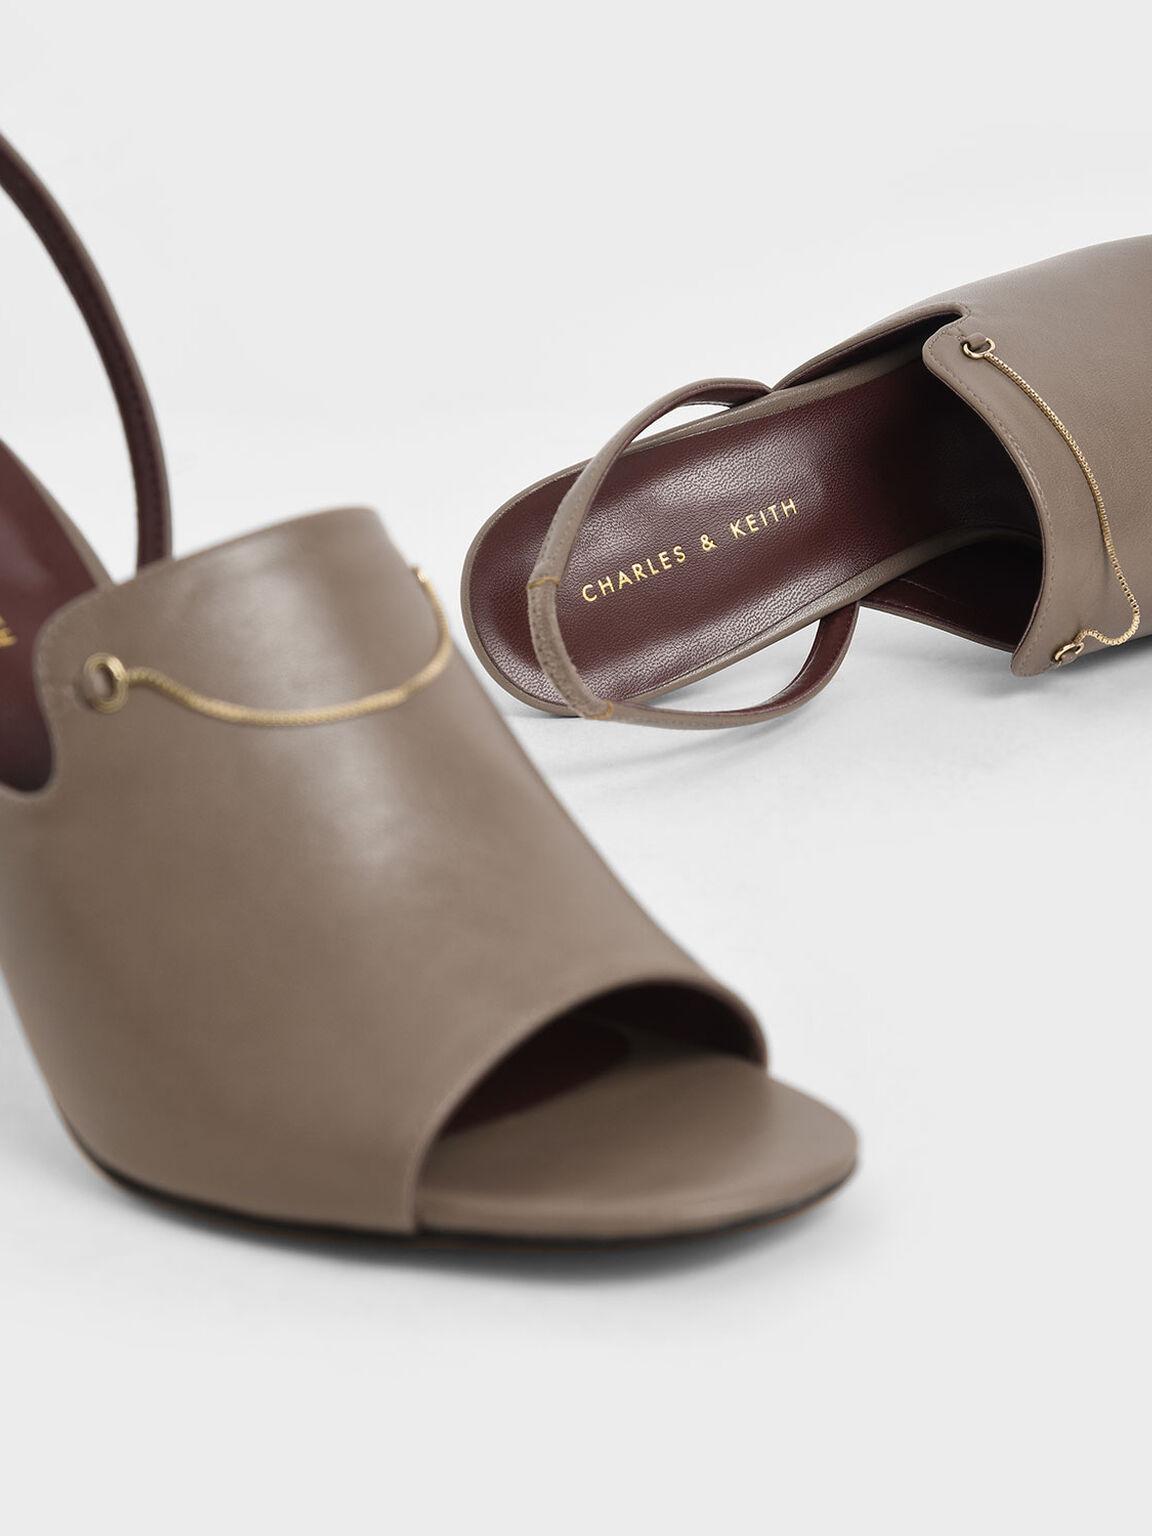 Chain Link Slingback Heels, Taupe, hi-res